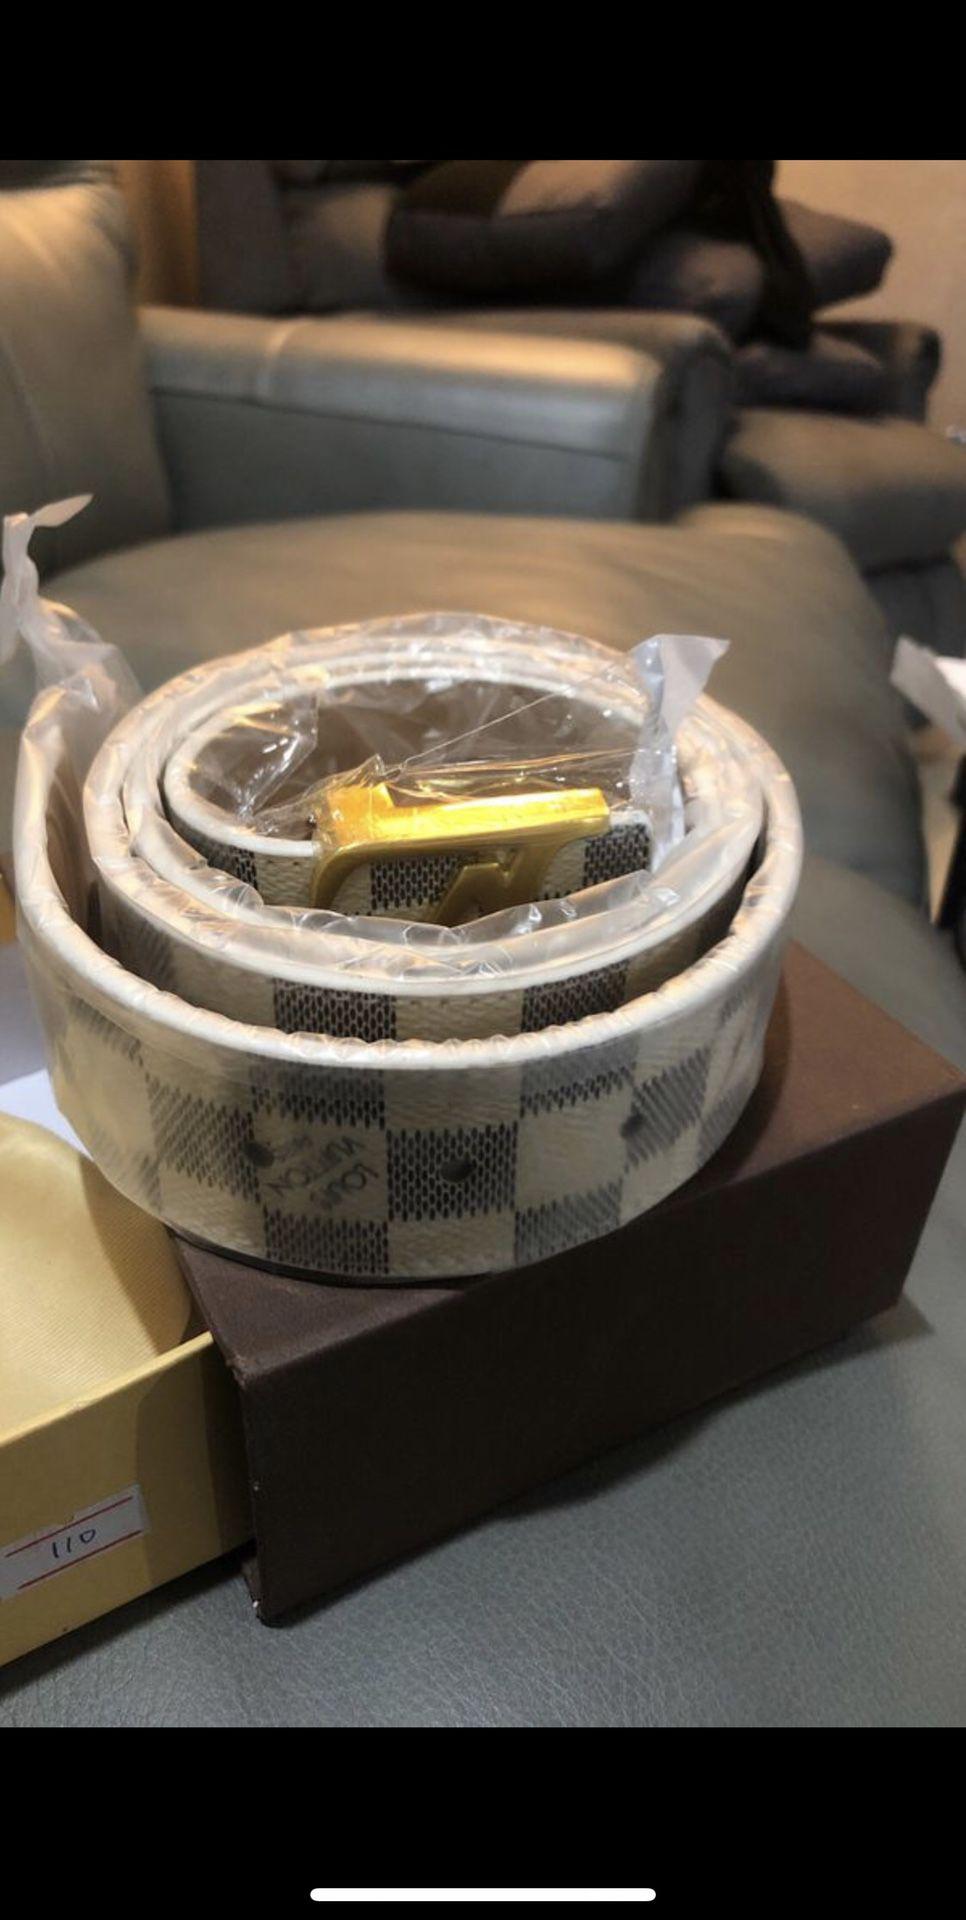 Lv brand new belt